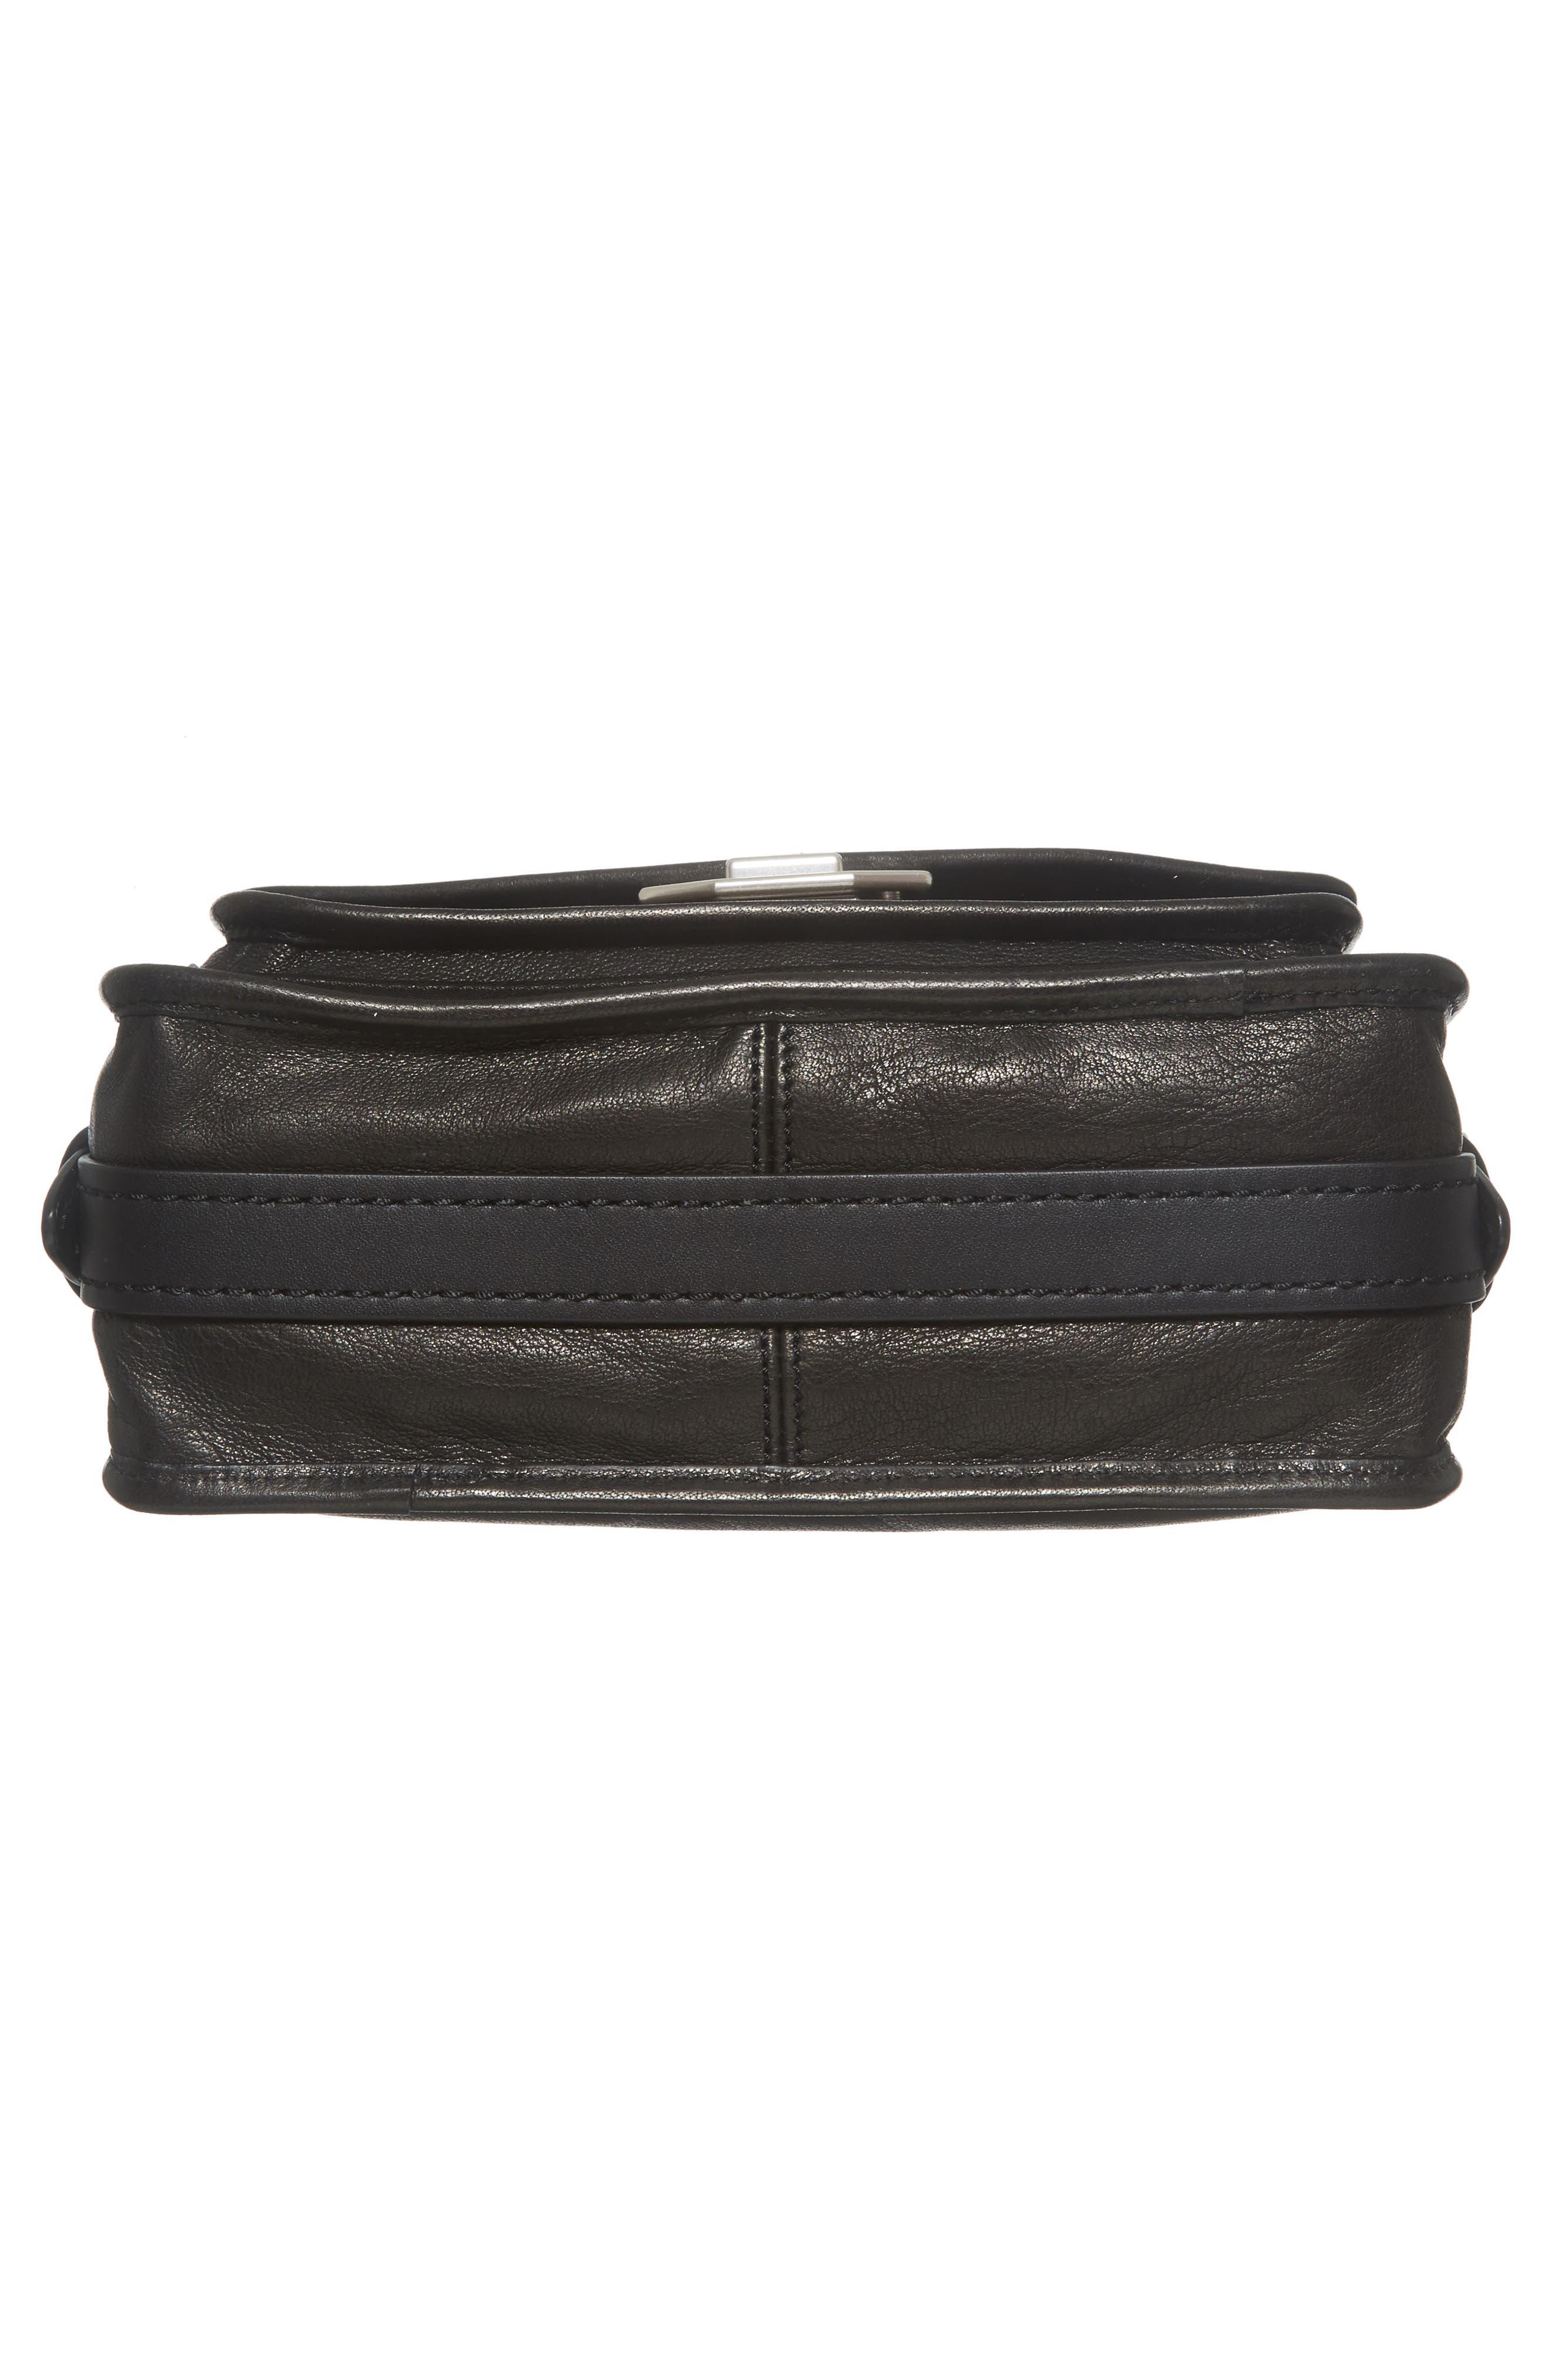 Small Field Leather Messenger Bag,                             Alternate thumbnail 5, color,                             Black